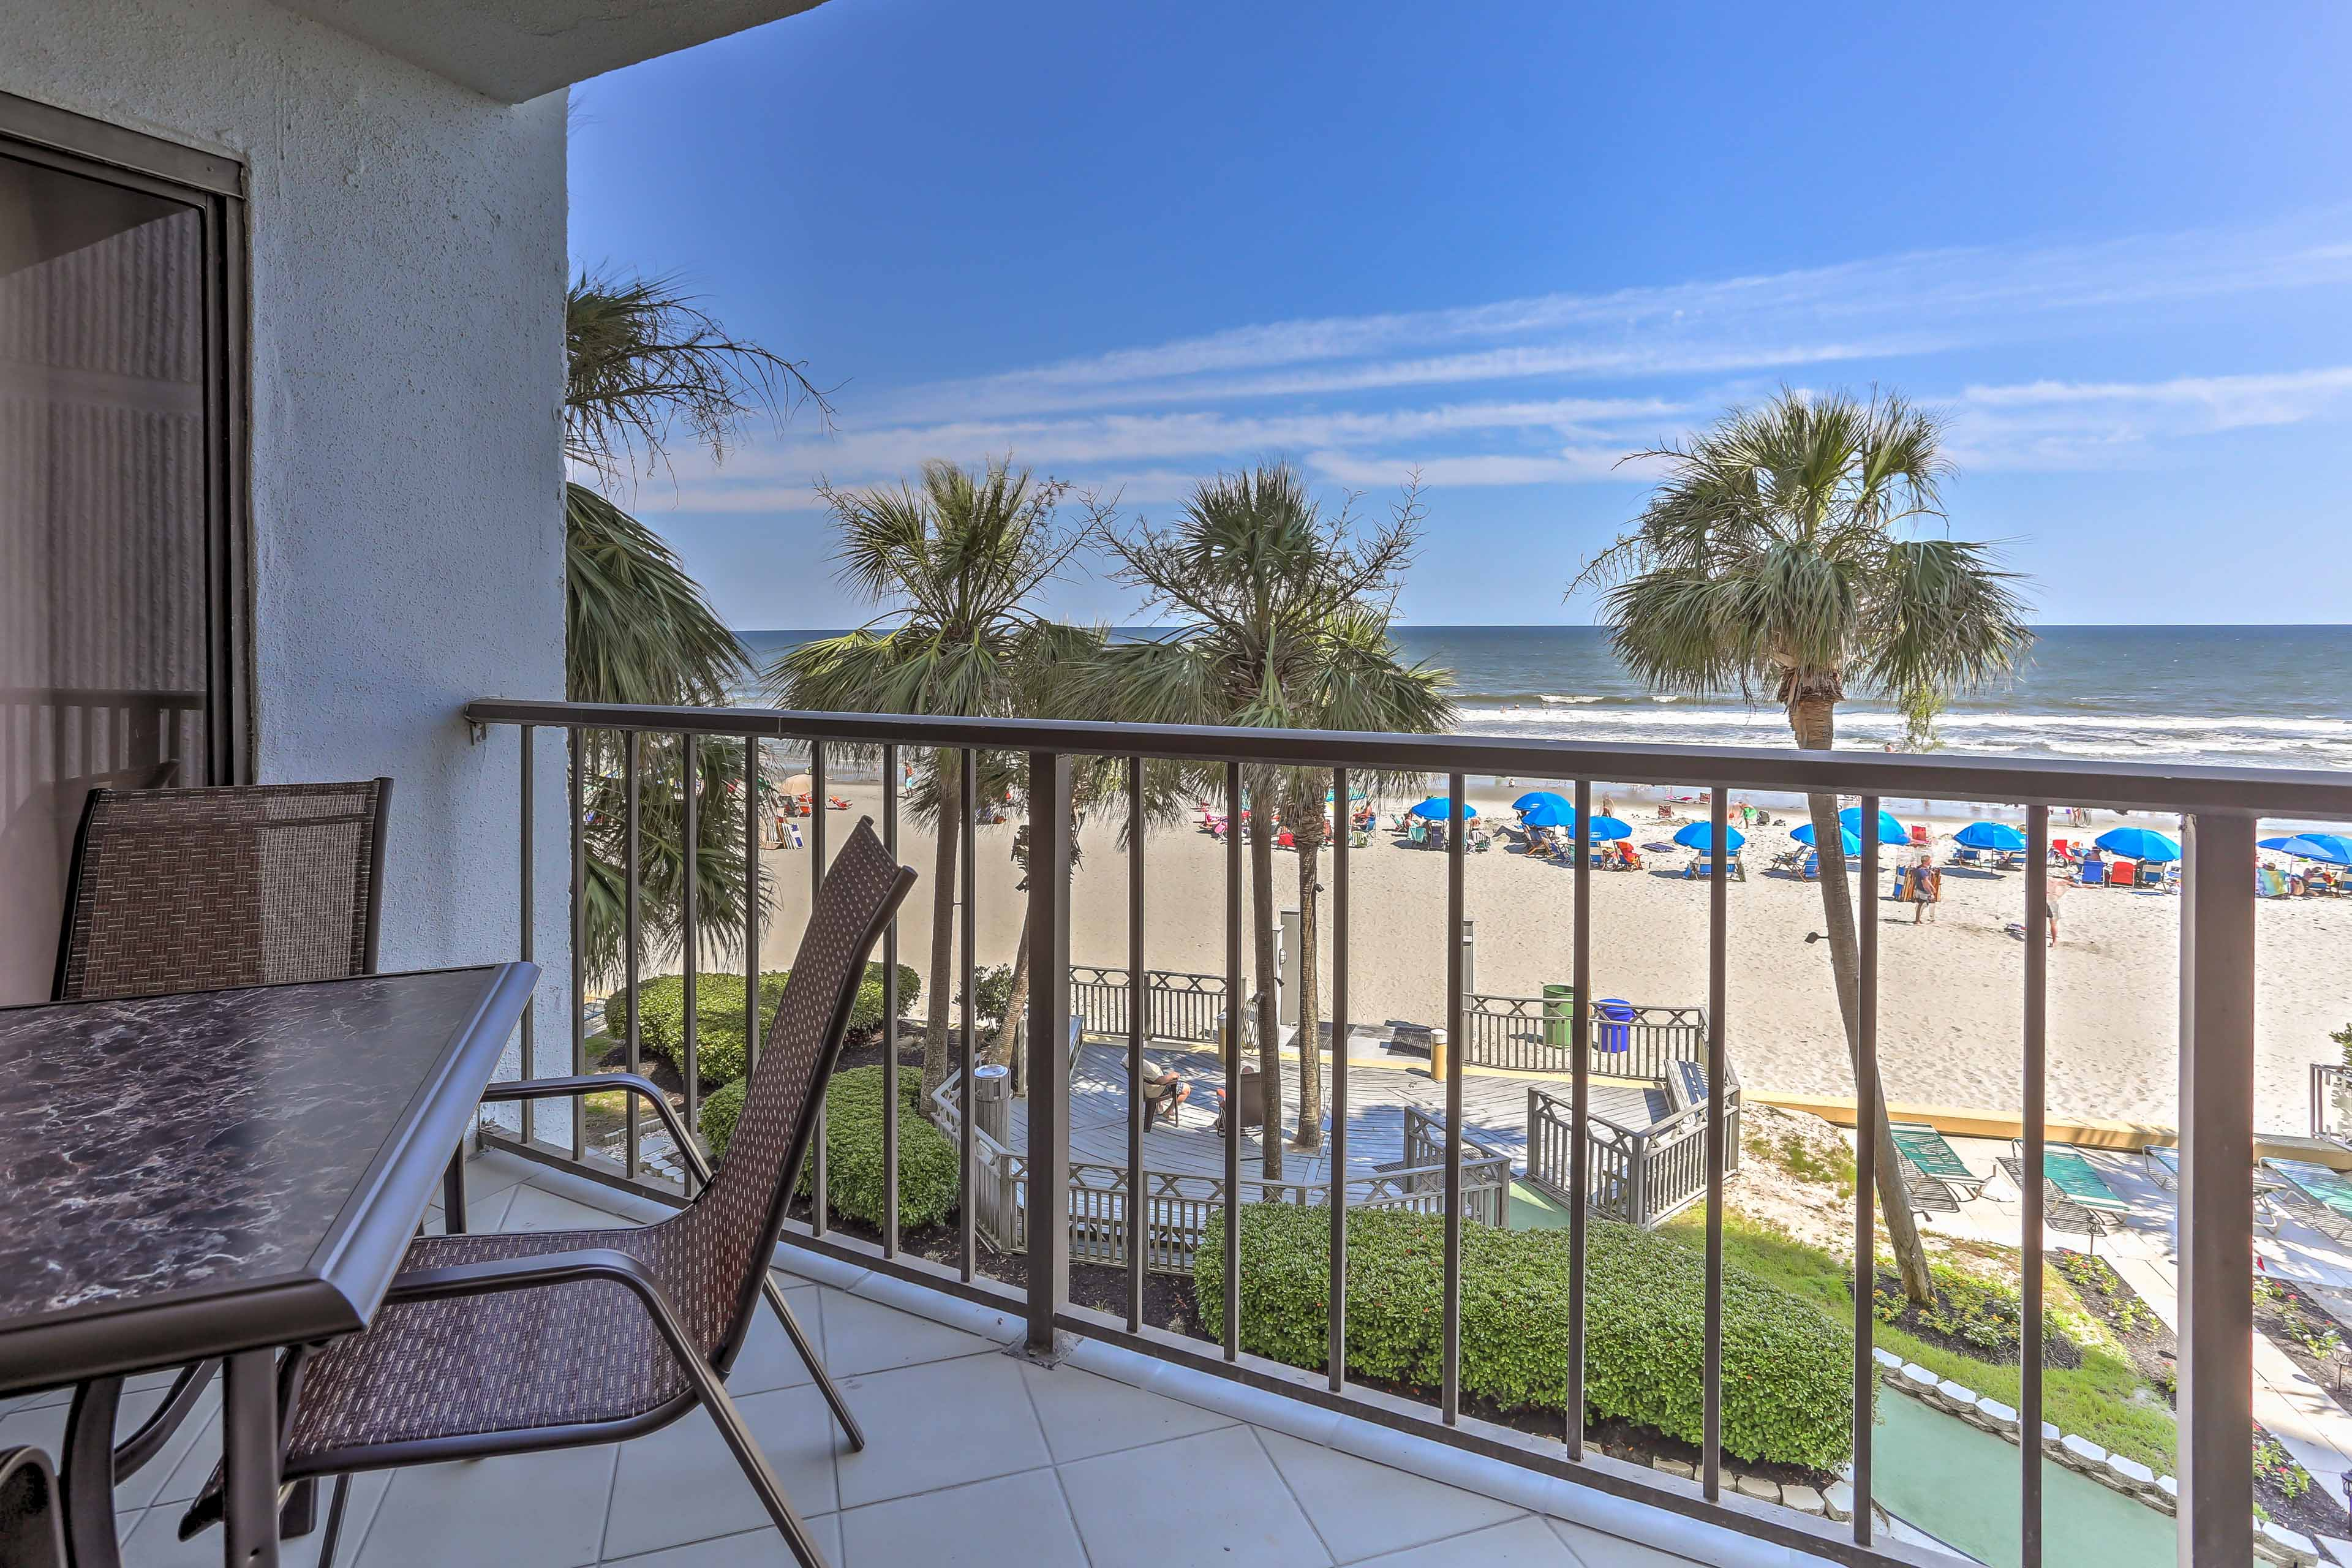 Plan your South Carolina escape to 'LazSeaDays,' a 2-bed, 2-bath condo!